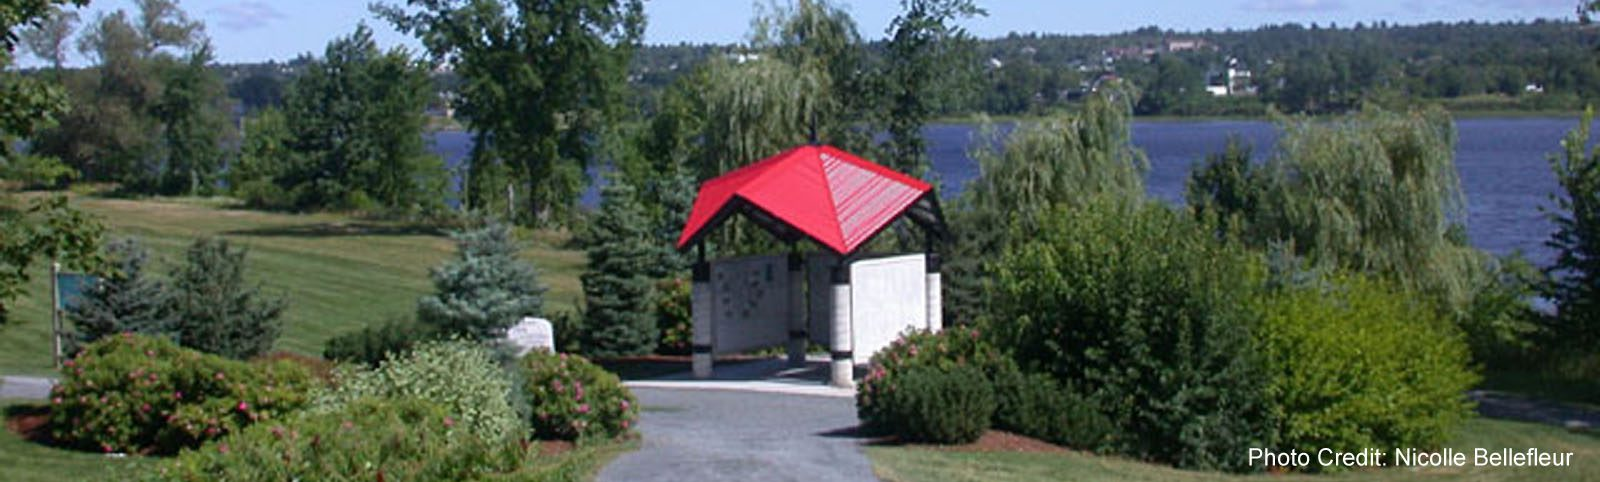 Fredericton - Bike Path Park - Information Center - sliver (Nicolle Bellefleur)